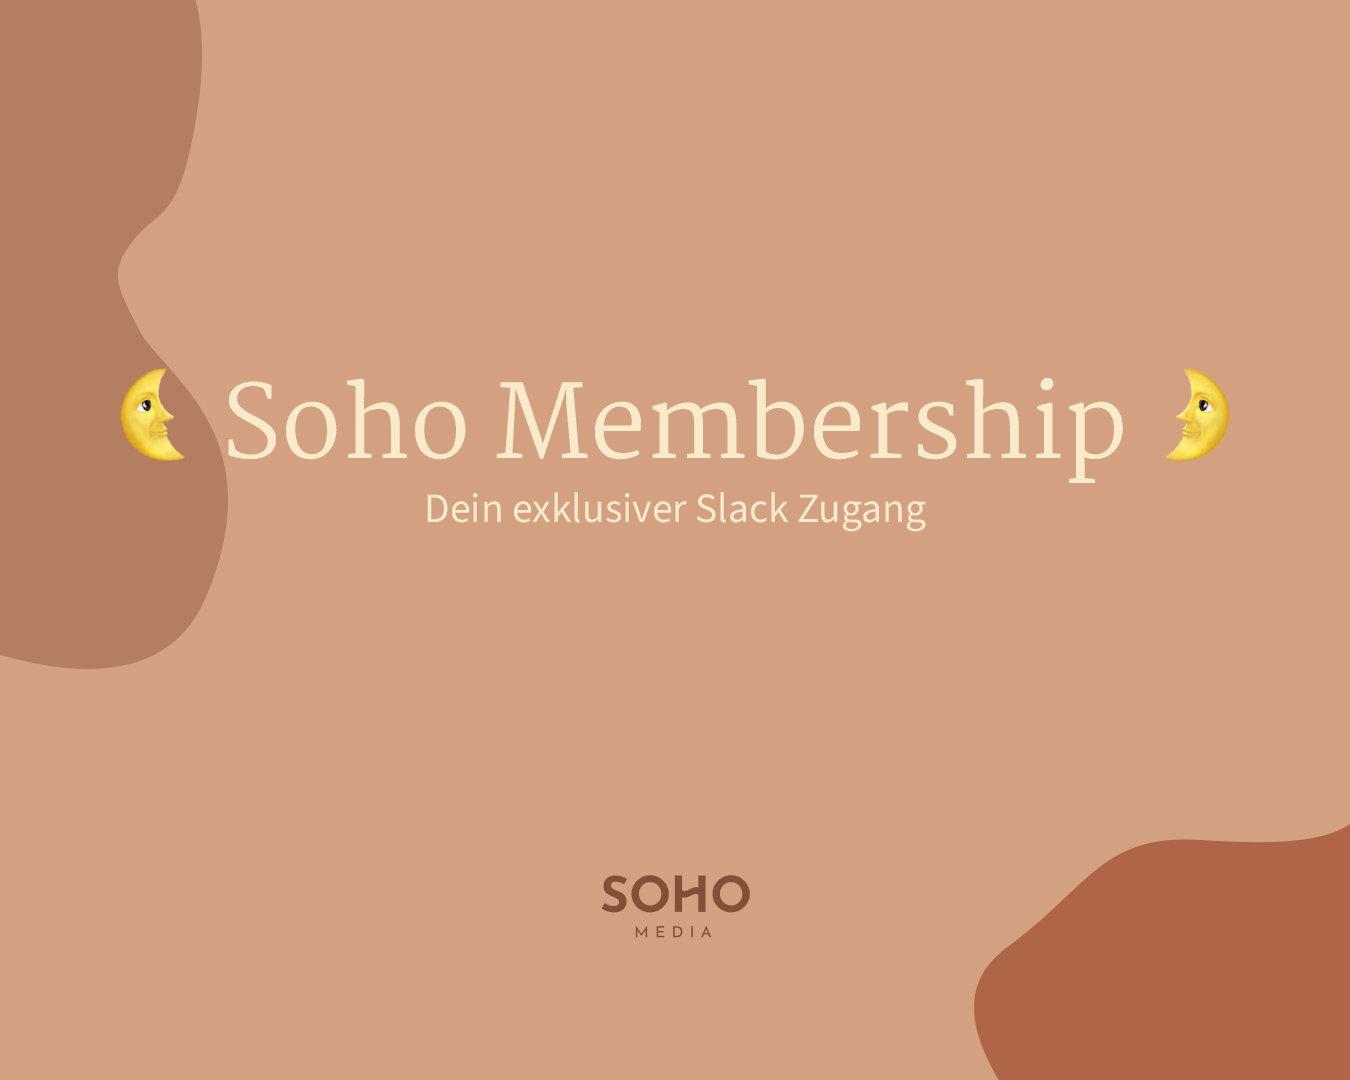 Soho Membership - Slack (Moon) 🌛